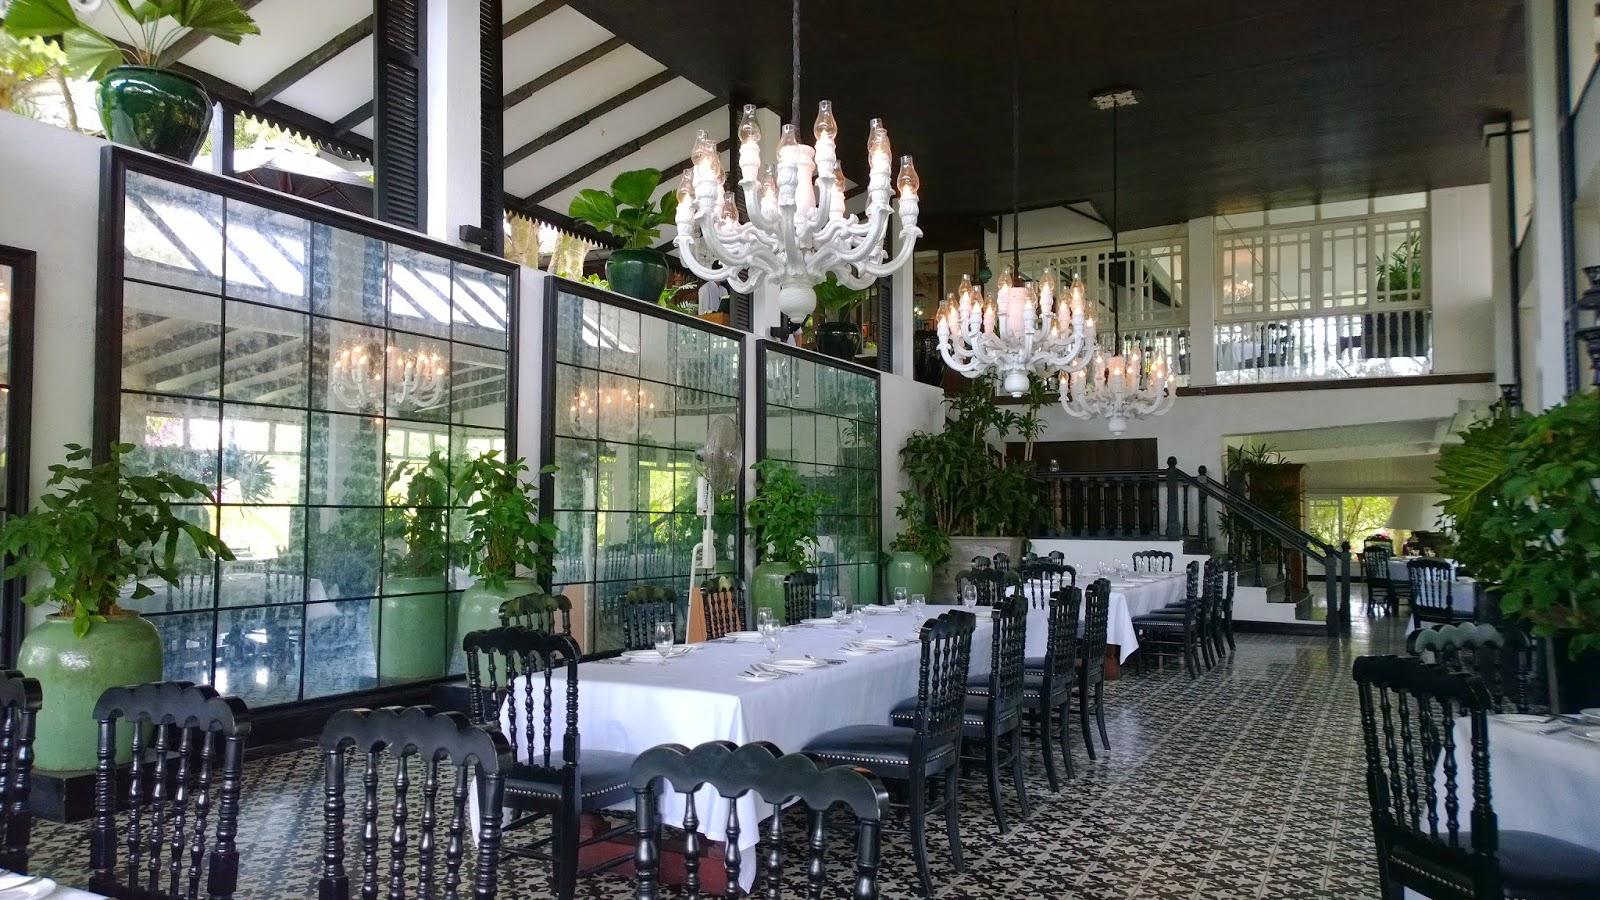 Antonio's Tagaytay Restaurant